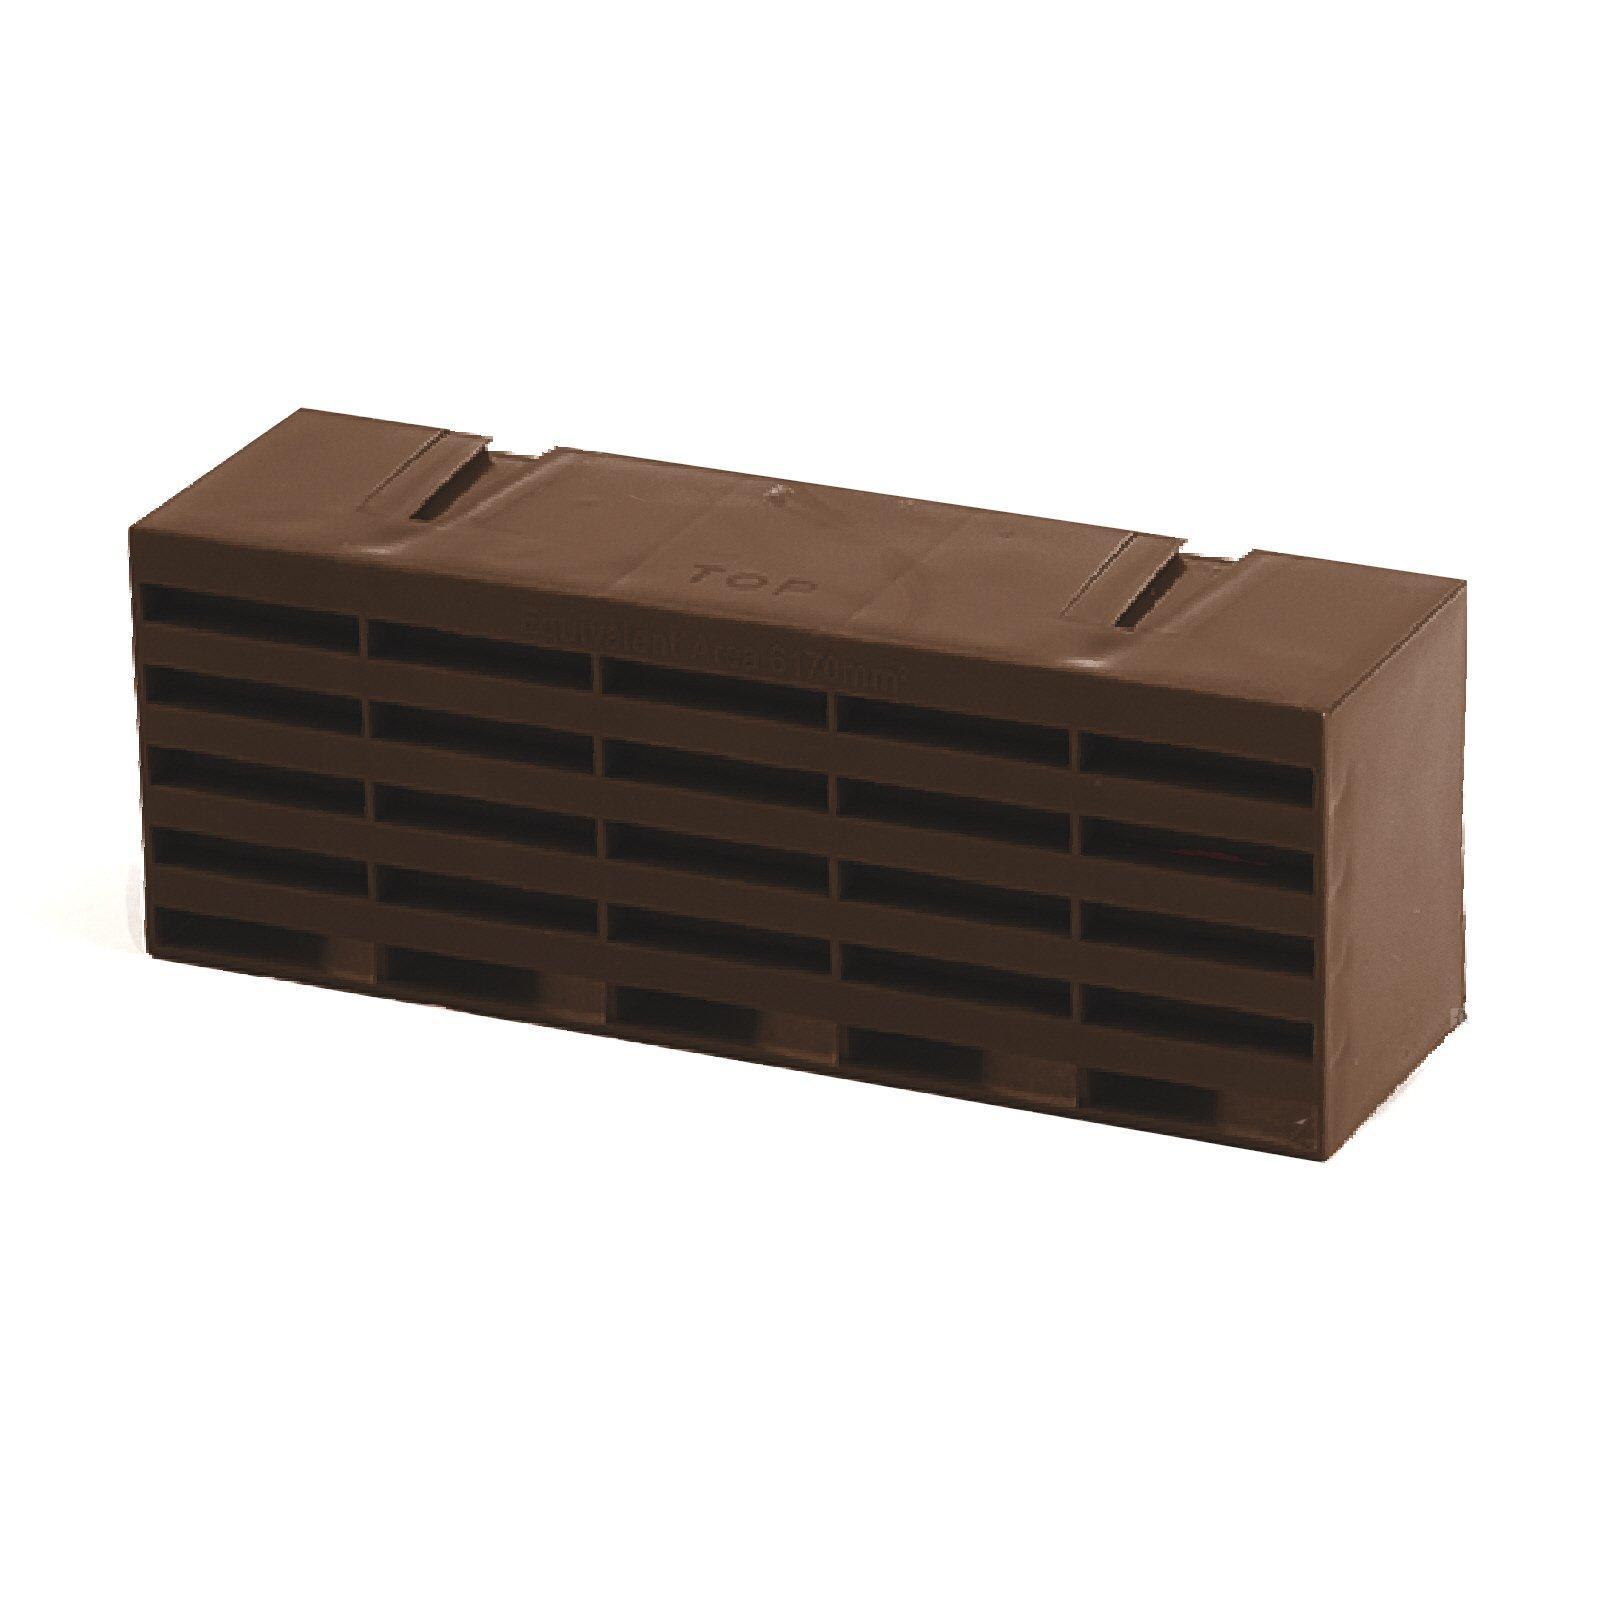 5 x Brown Air Bricks Vent 9''x 3'' Airbrick Grille Air Flow Brick Ventilation